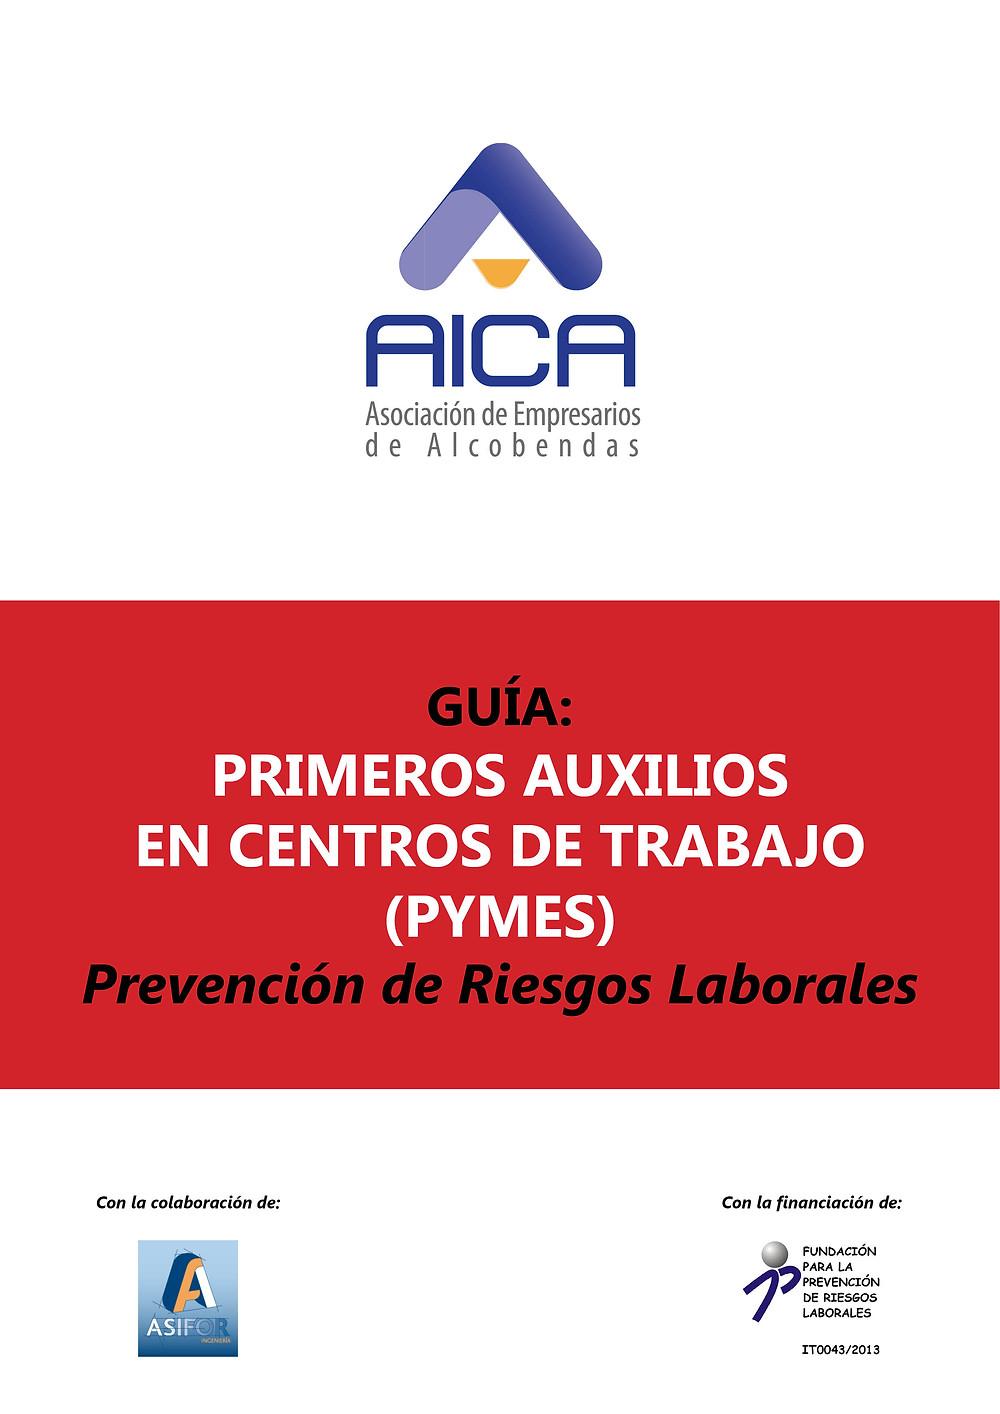 GUÍA_PRL_PRIMEROS_AUXILIOS.jpg